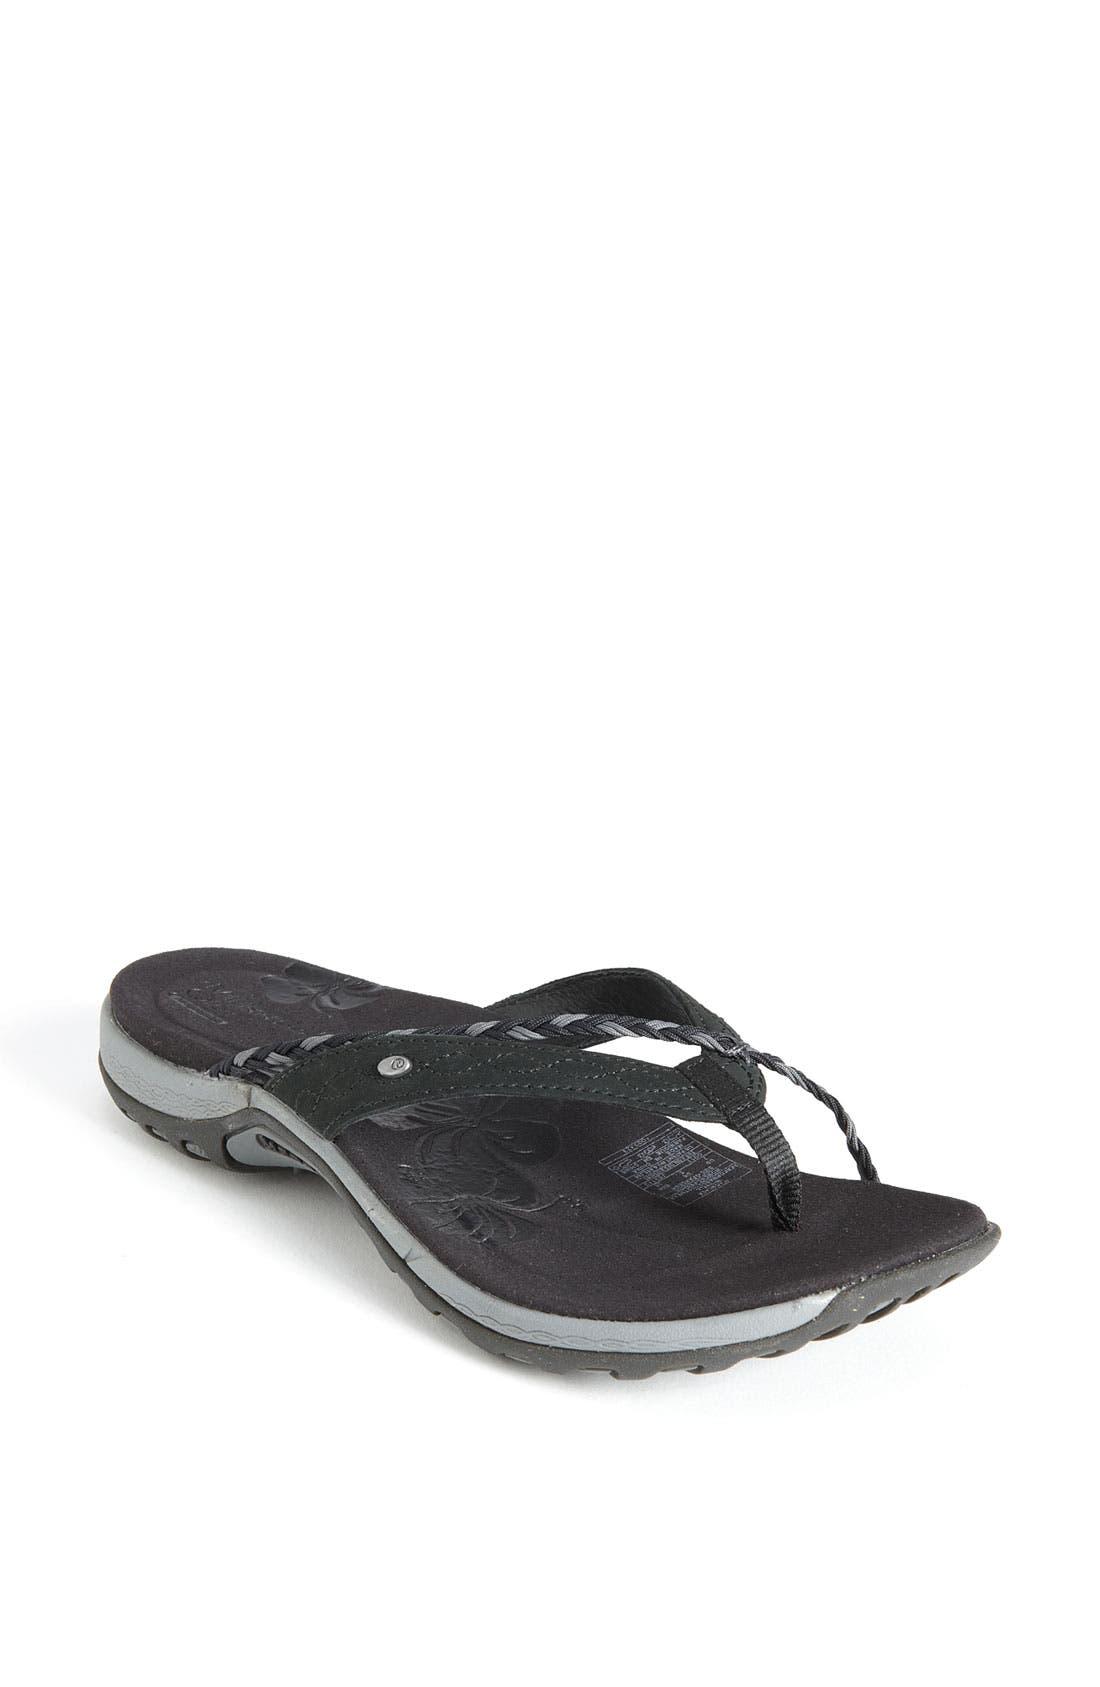 Main Image - Merrell 'Lilac' Sandal